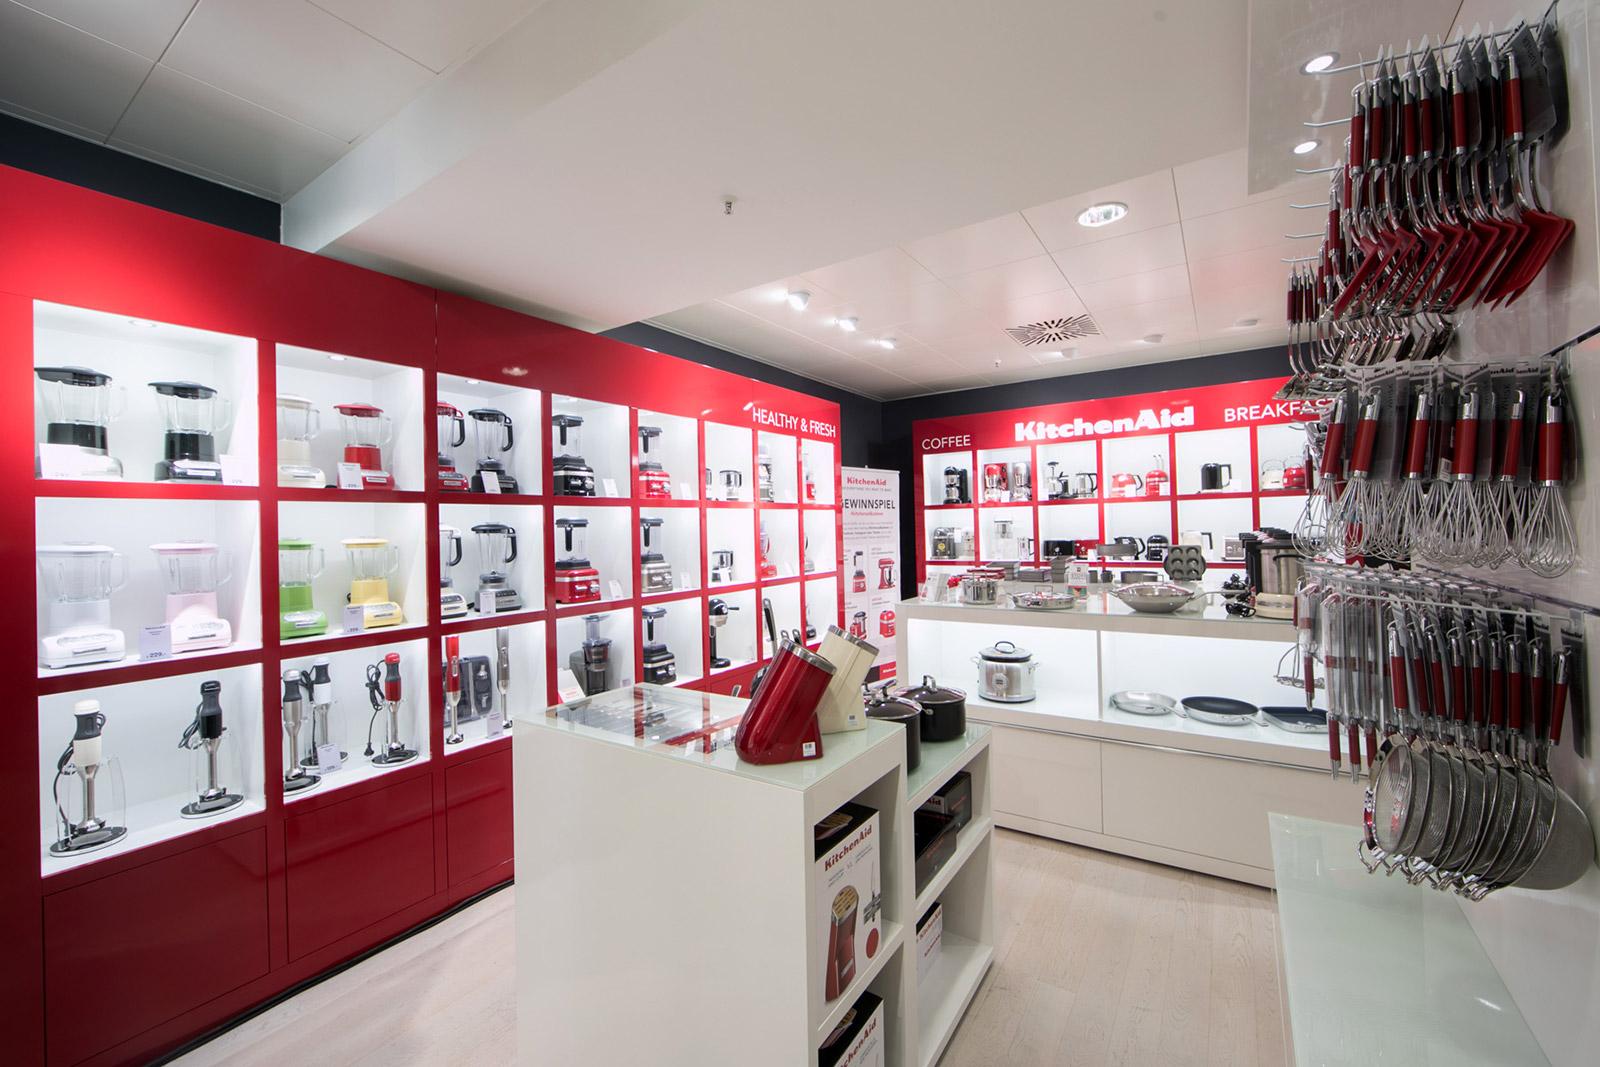 Shopping Ambiente Par Excellence Kitchenaid Store Im Kadewe